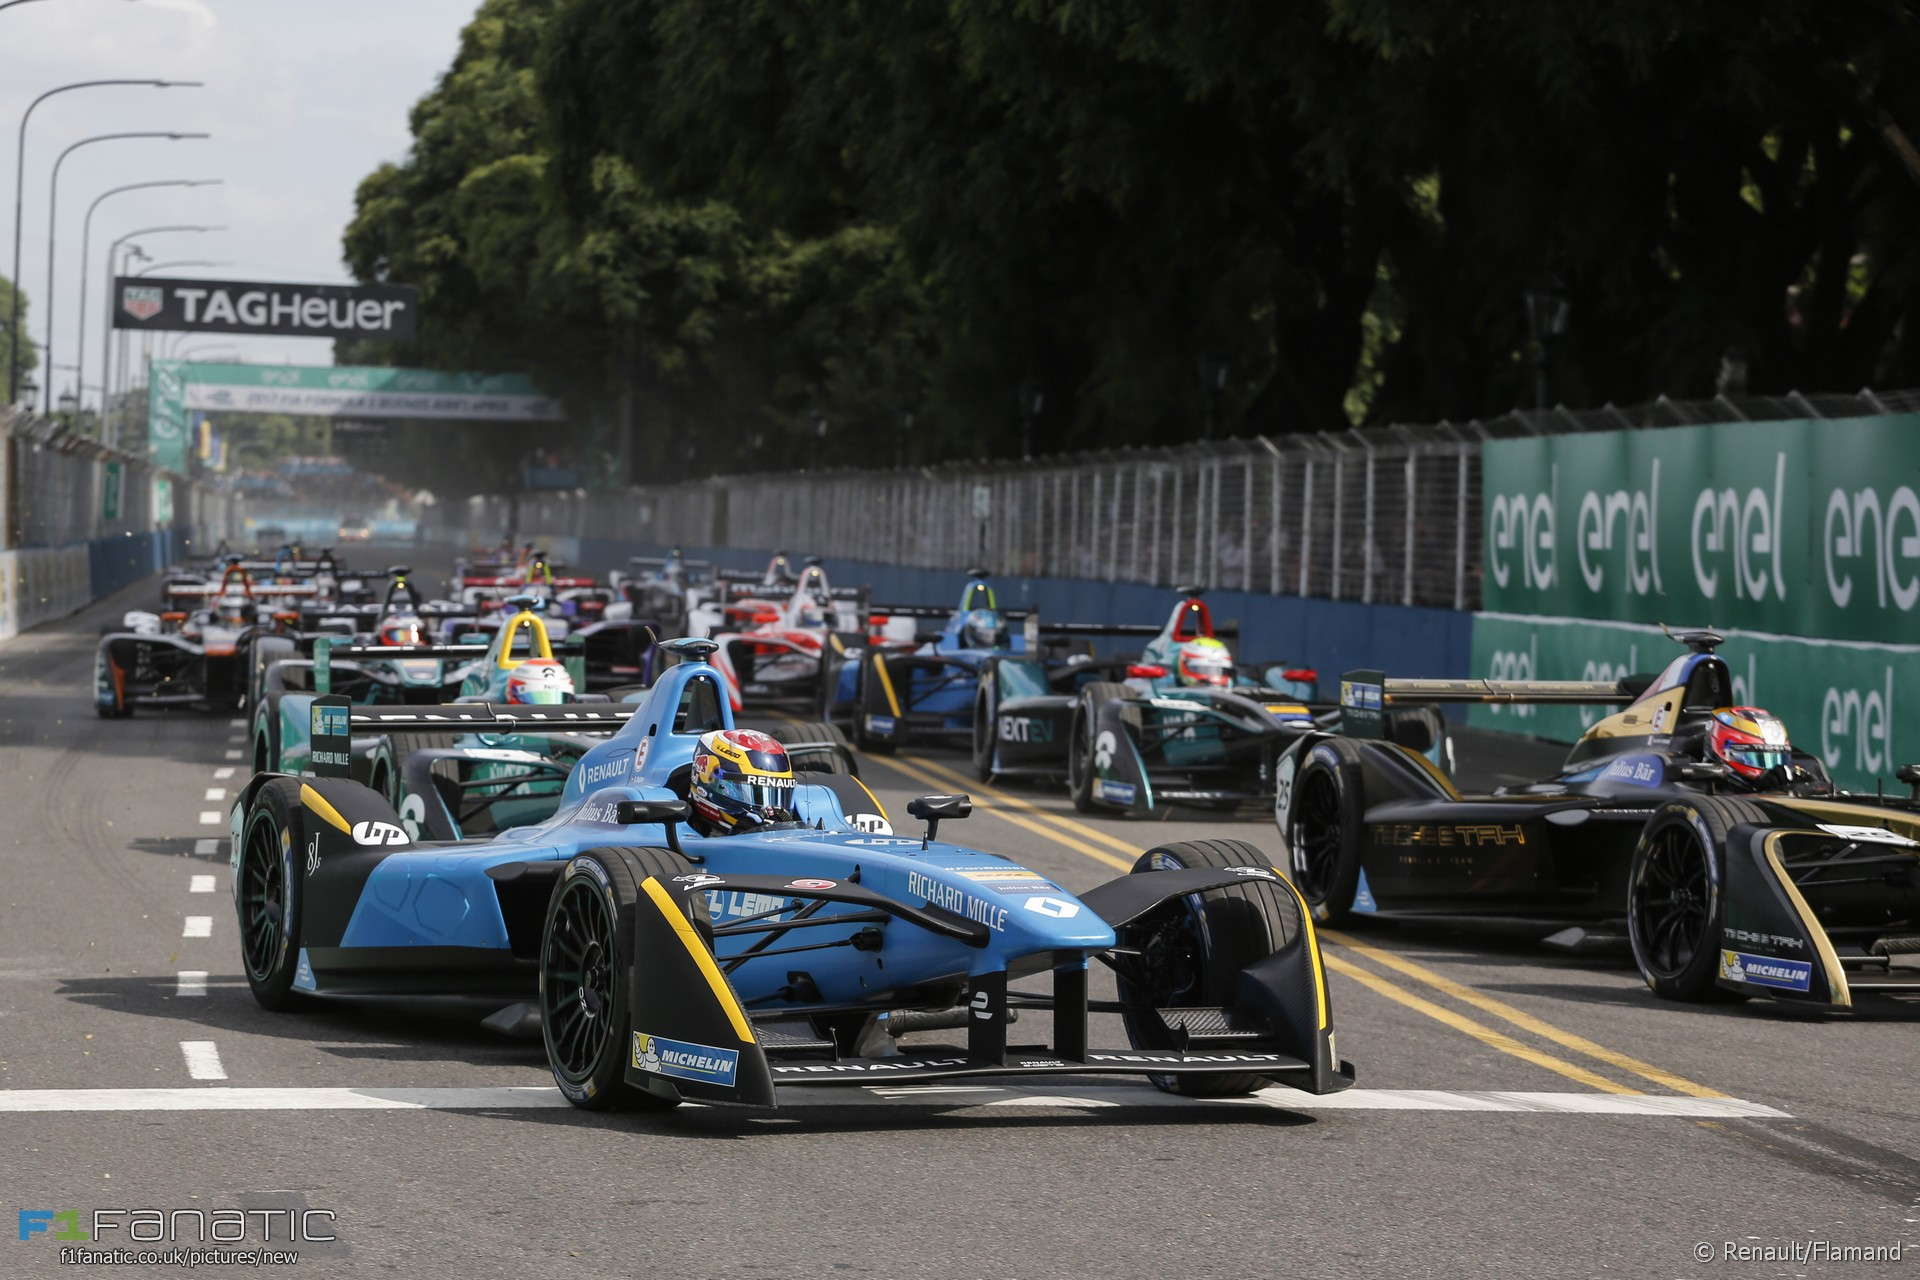 Sebastien Buemi, Formula E, Buenos Aires, 2017